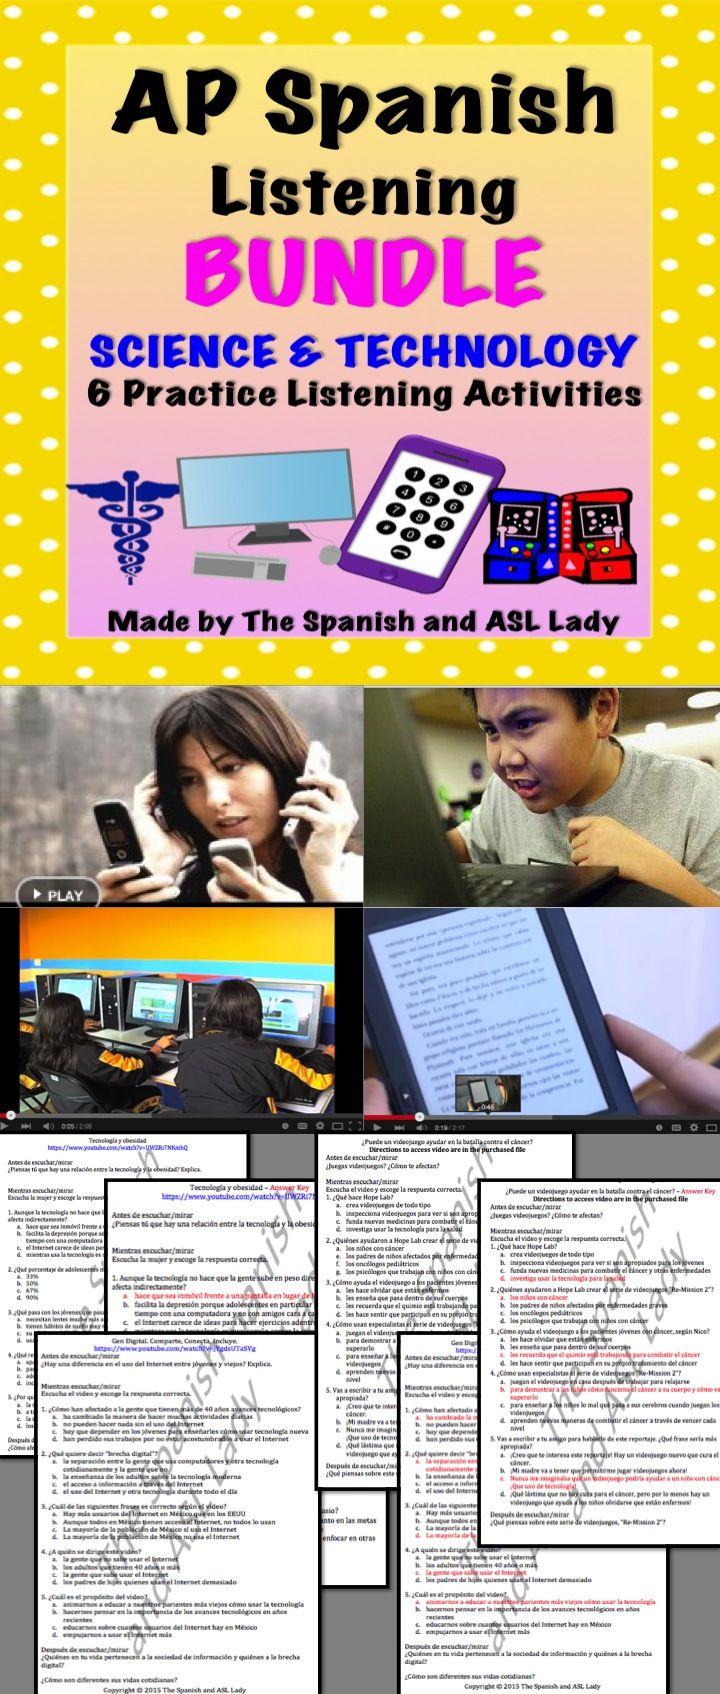 AP Spanish Language Exam, What to Expect?